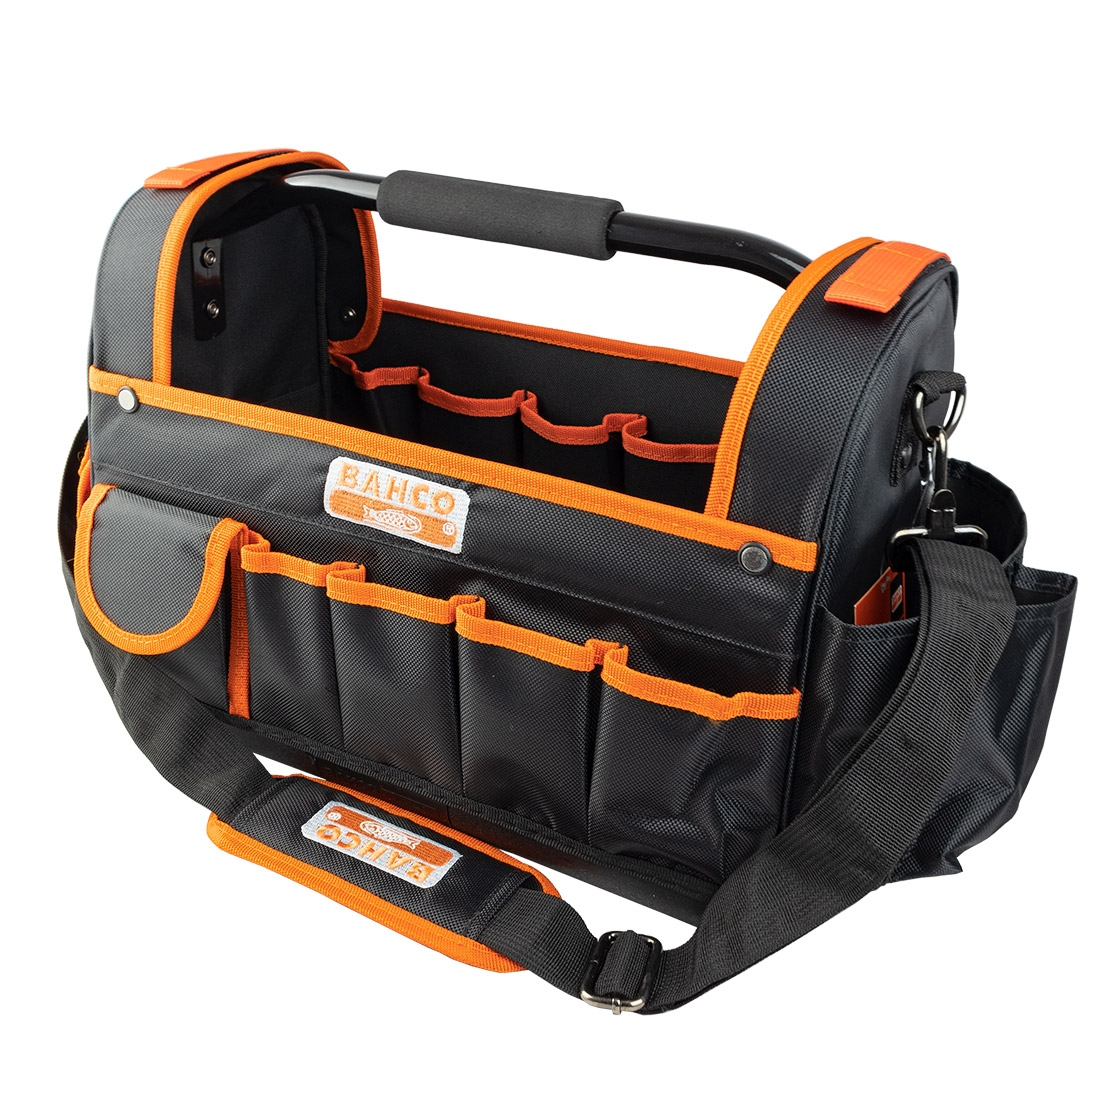 Bahco 3100TB Open Top Tote Tool Bag